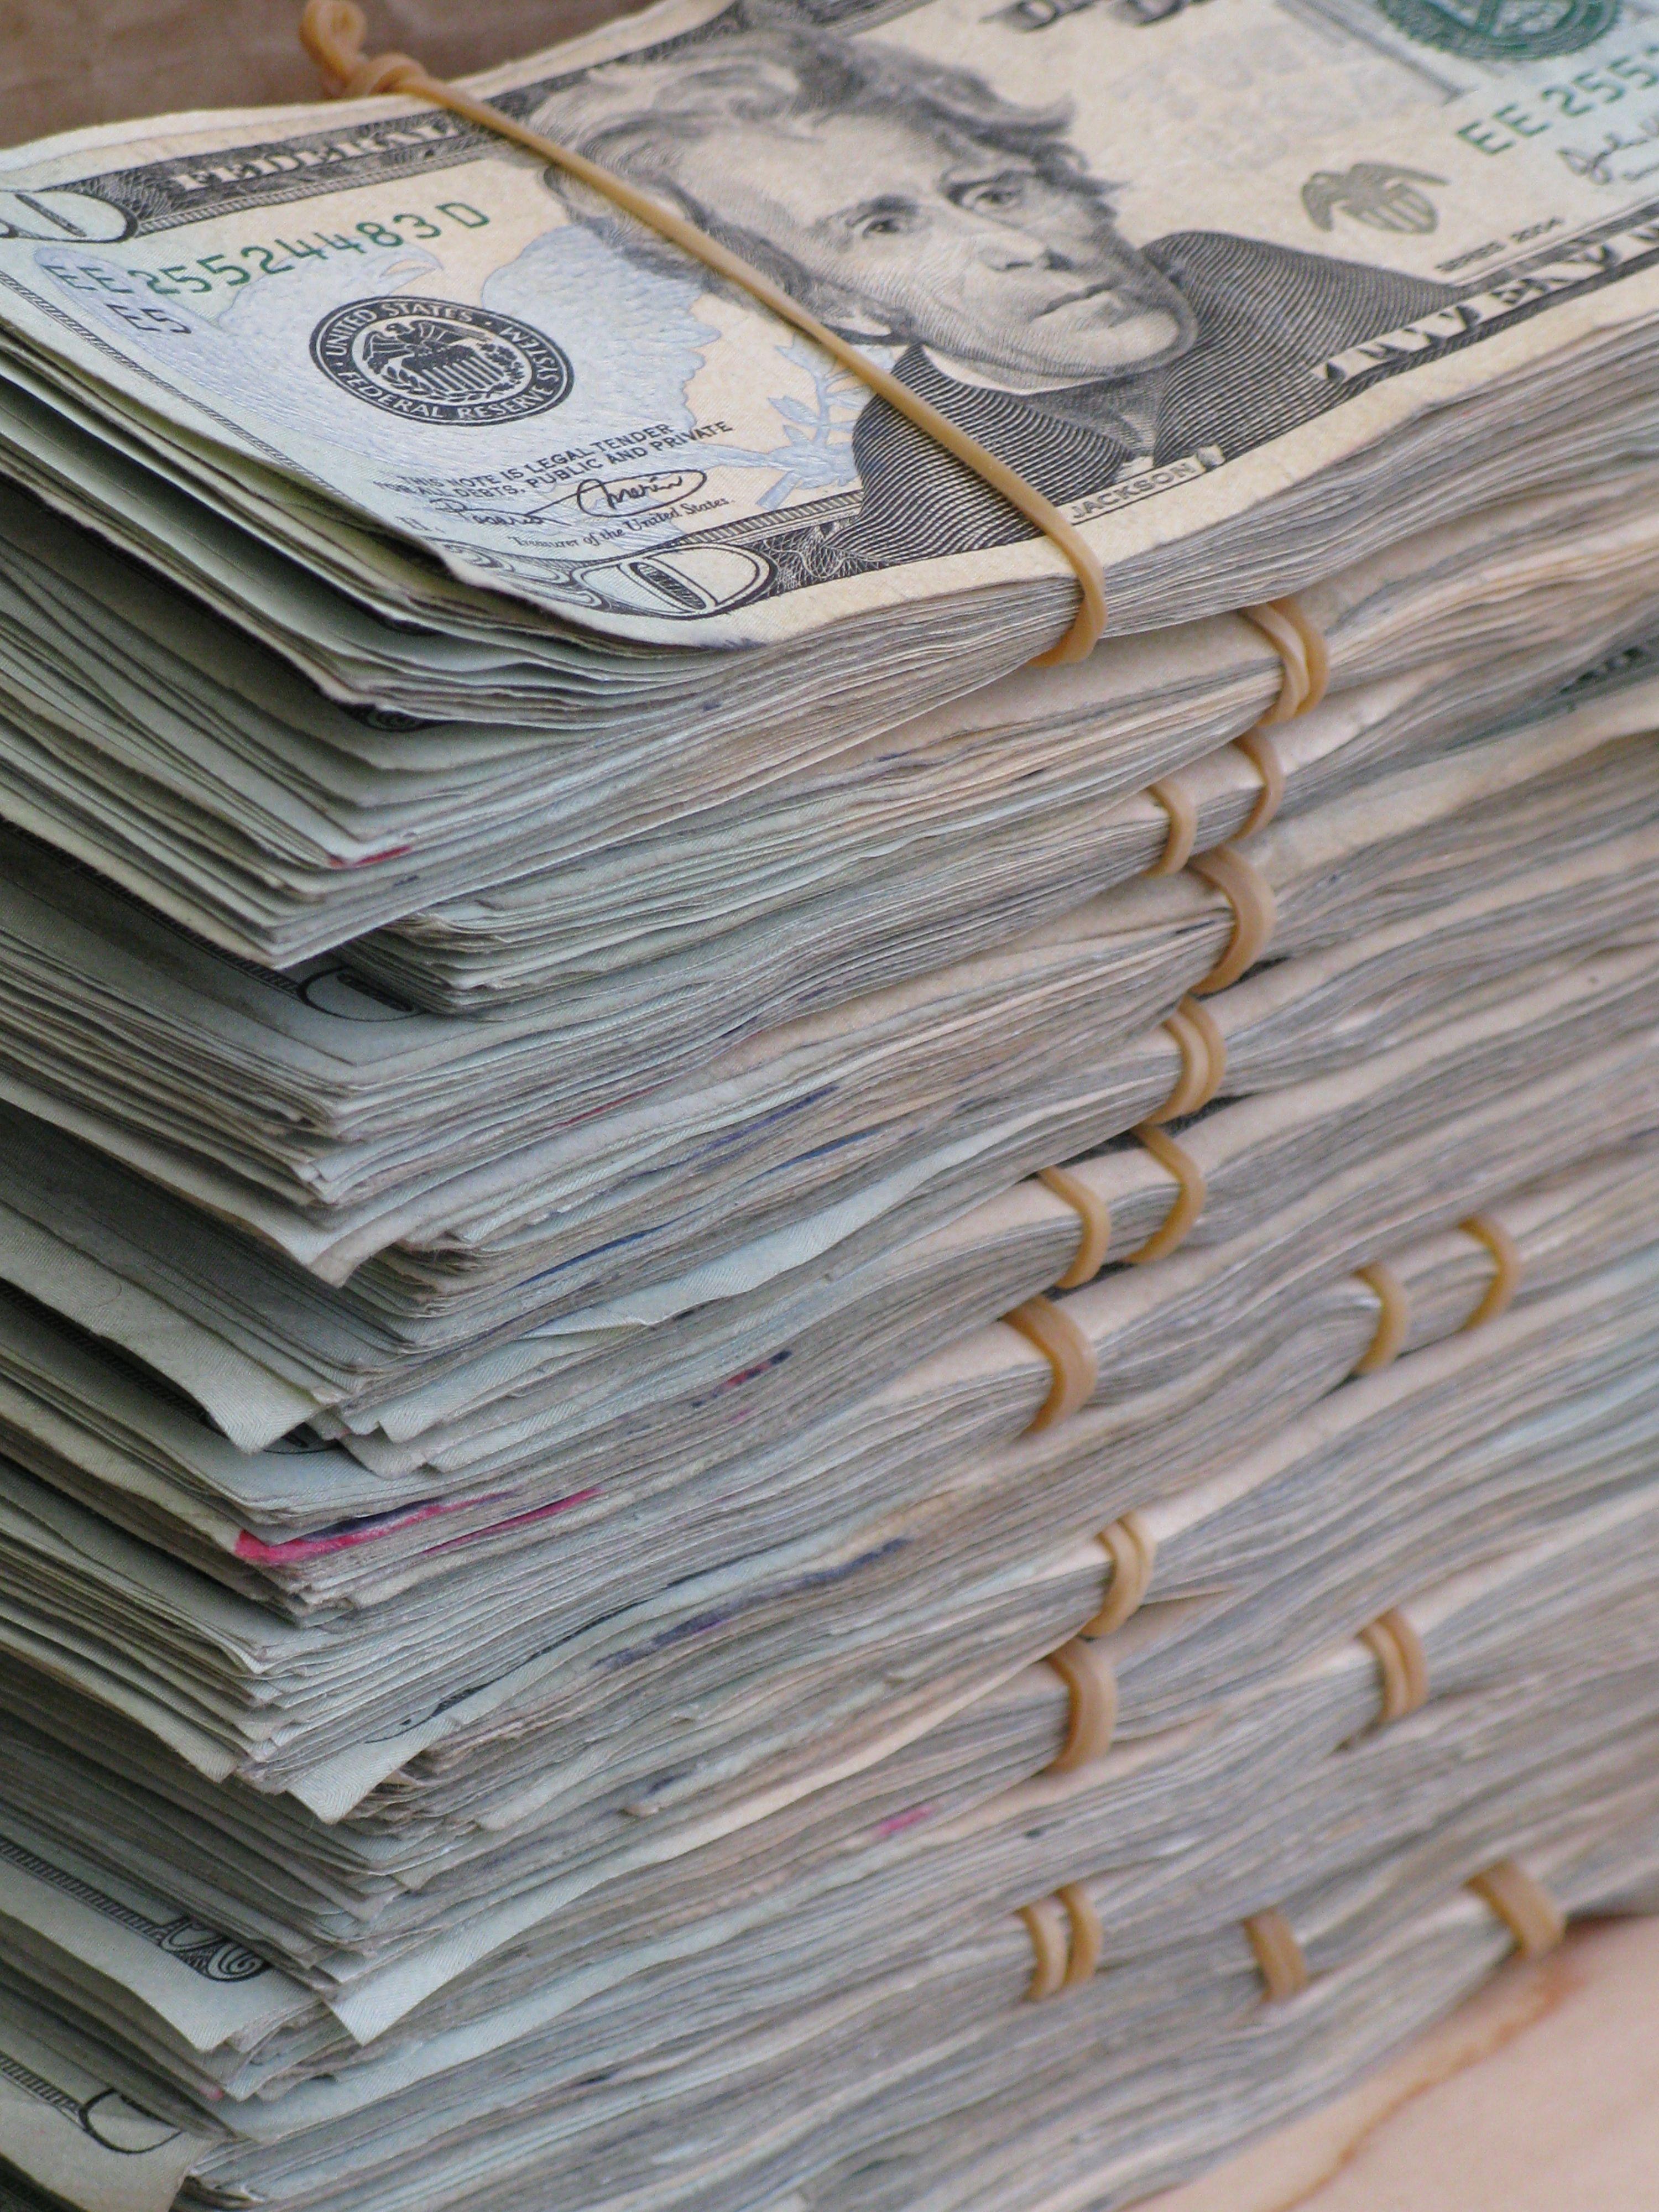 Real Money Stacks Money Stacks More Marijuanalingo